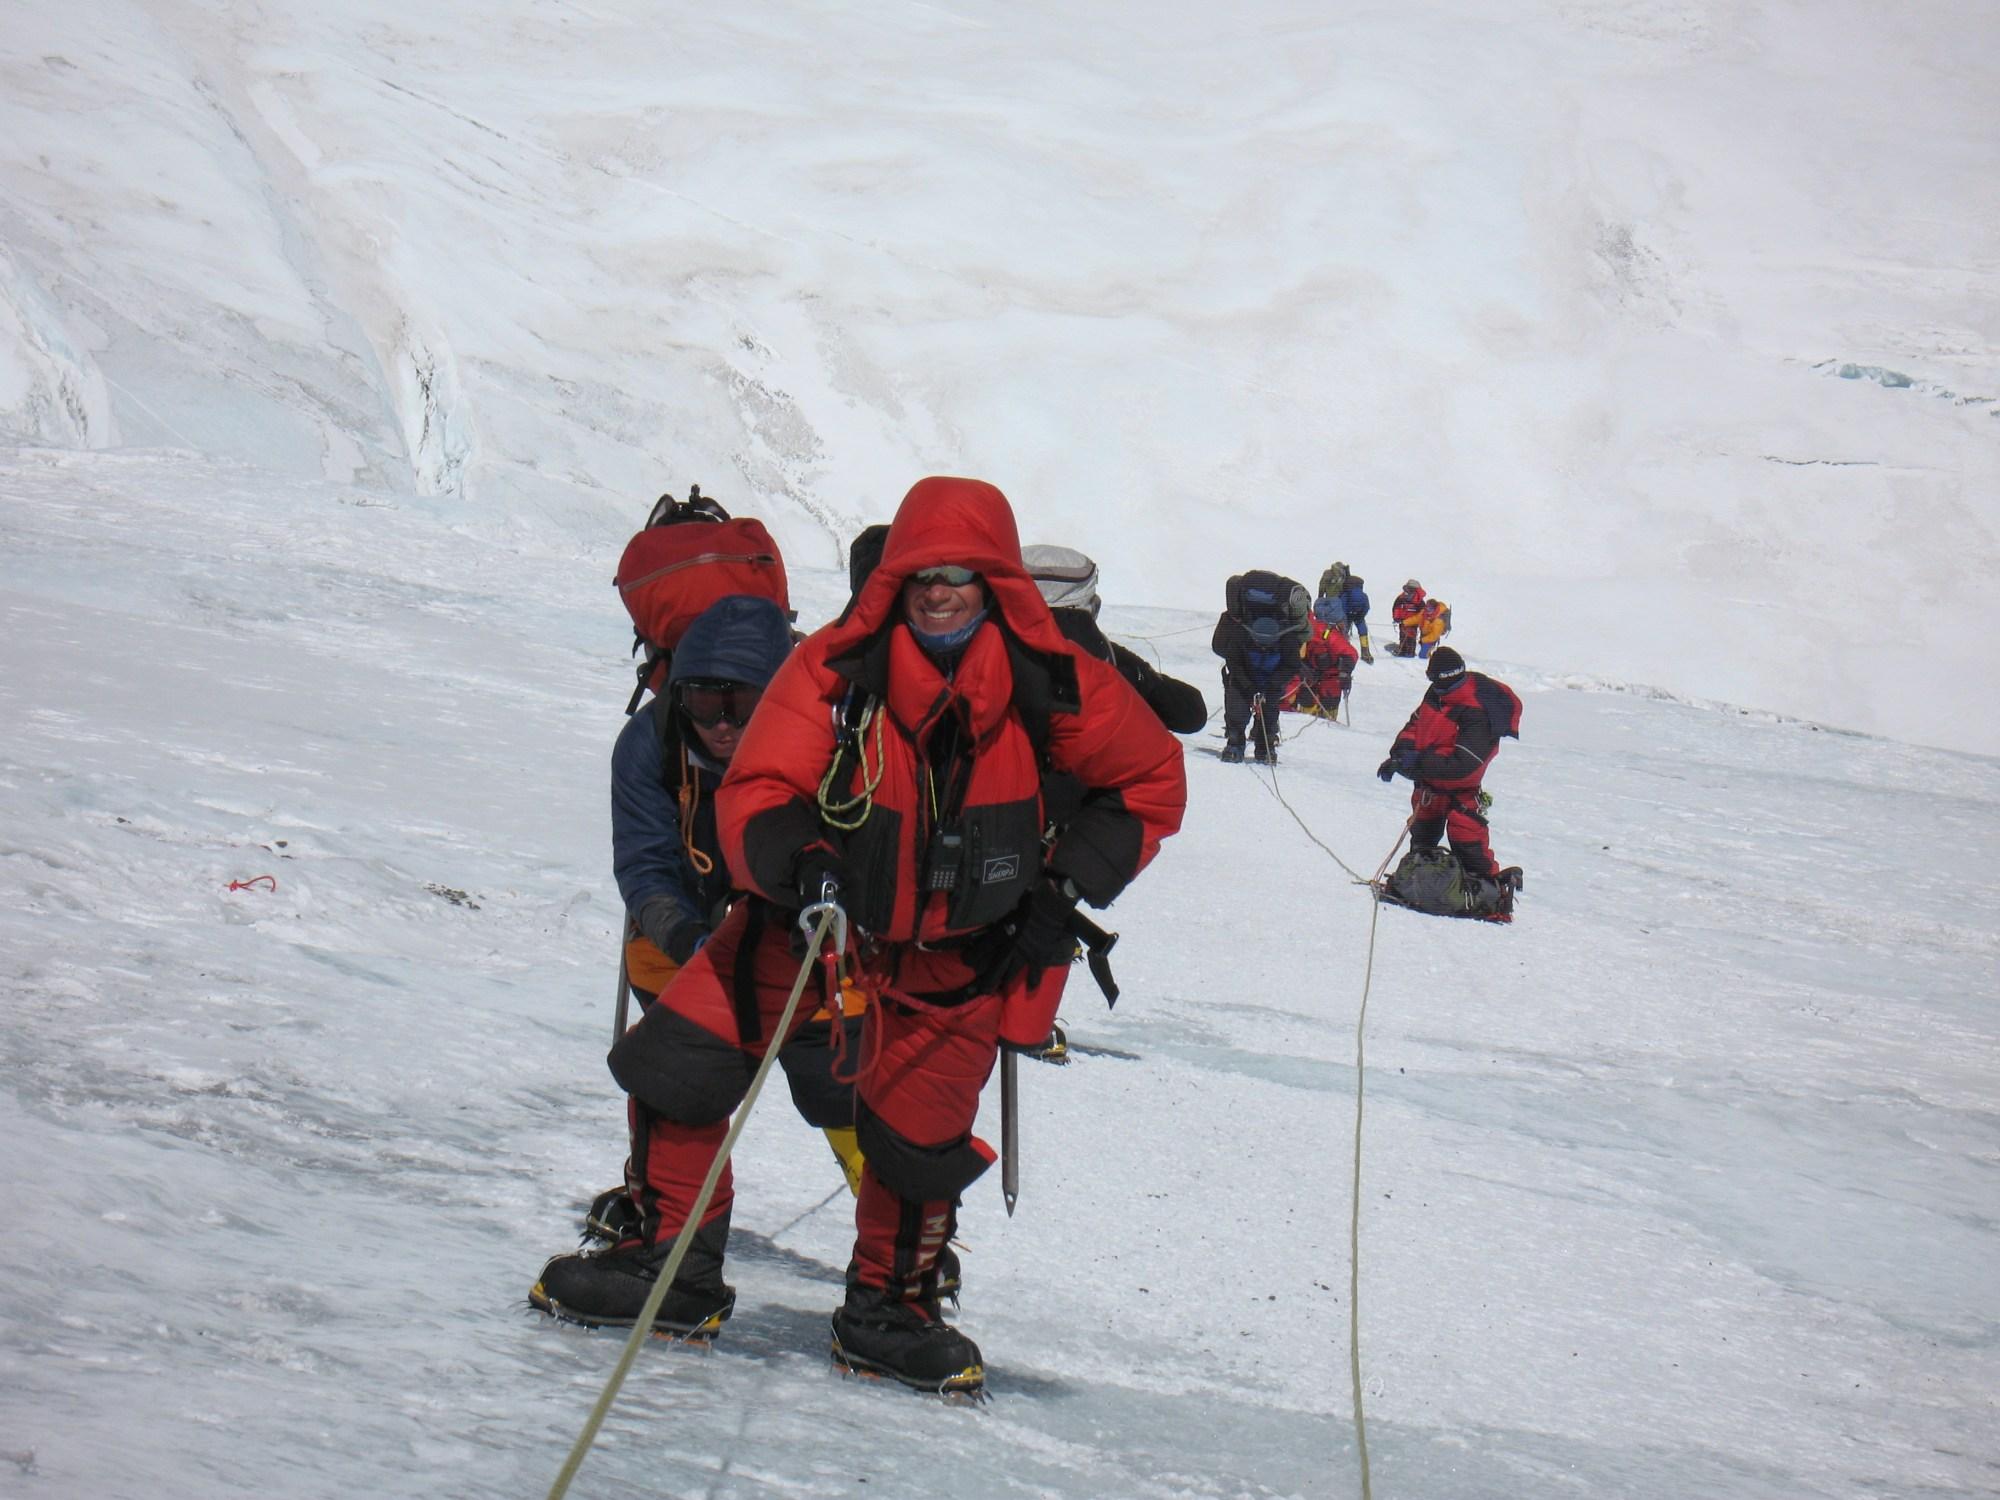 Everest, Lhotse Face, Vern Tejas